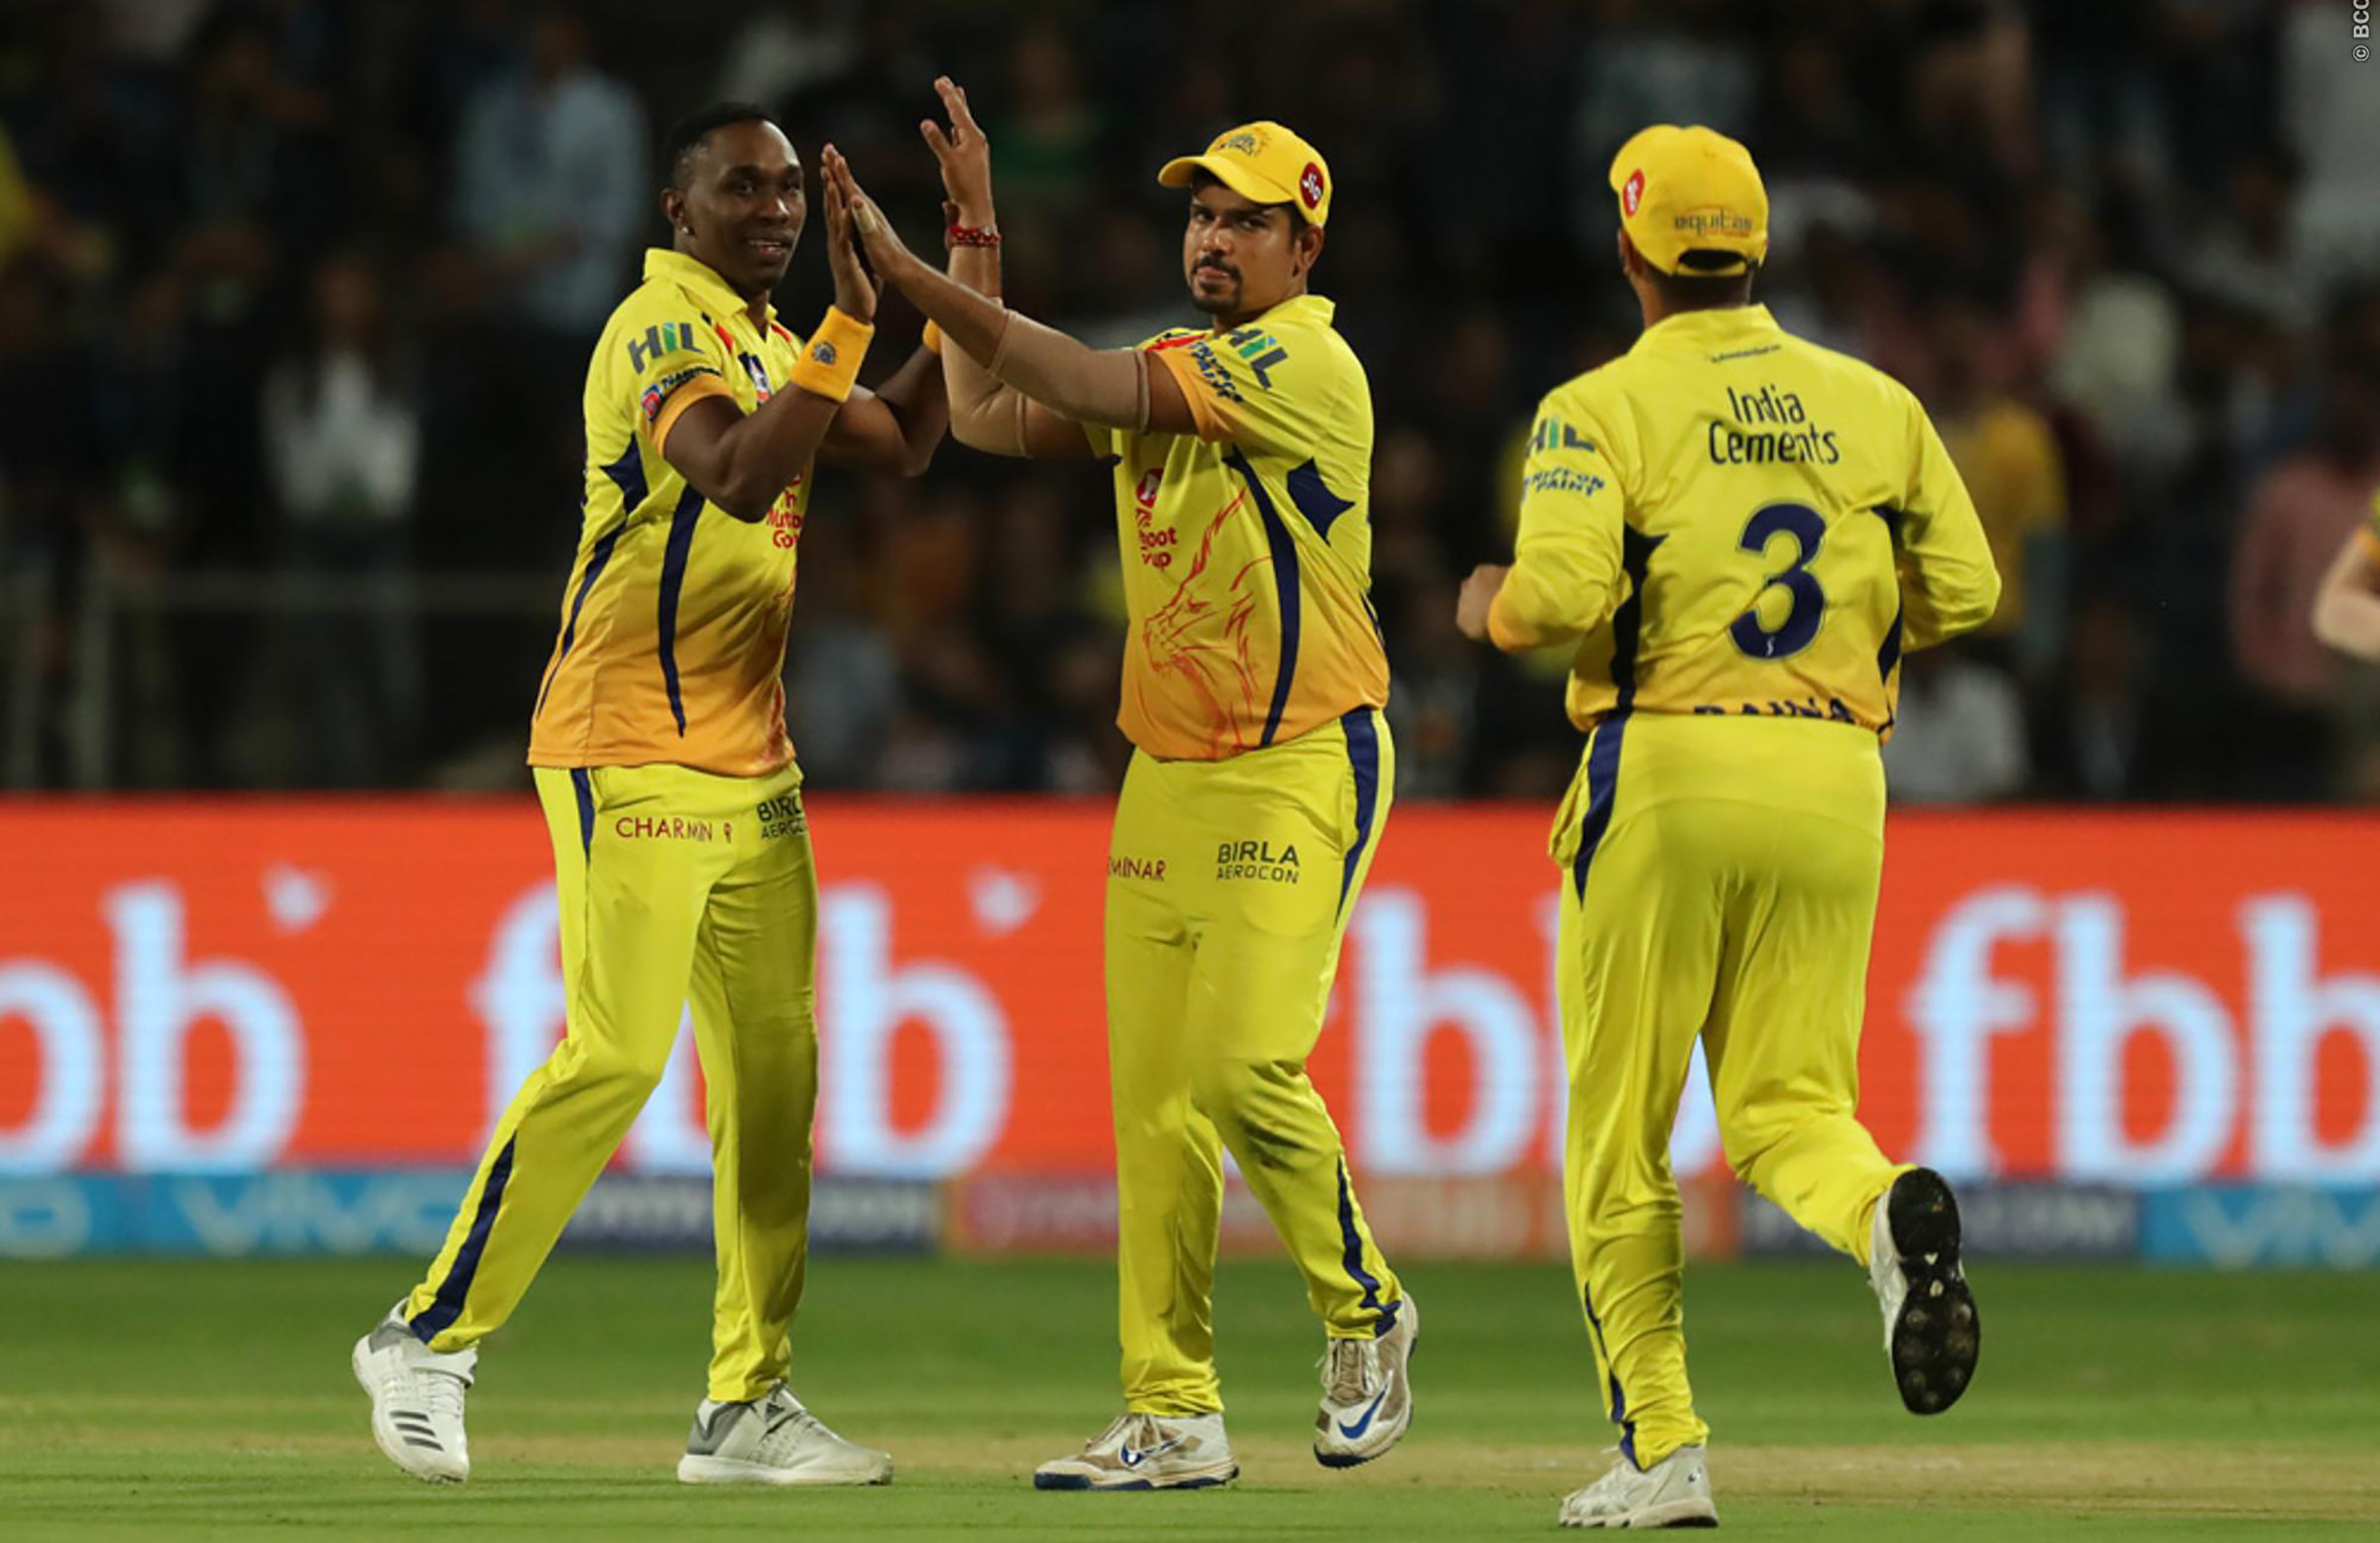 IPL: Rayudu, Raina lift CSK to 182/3